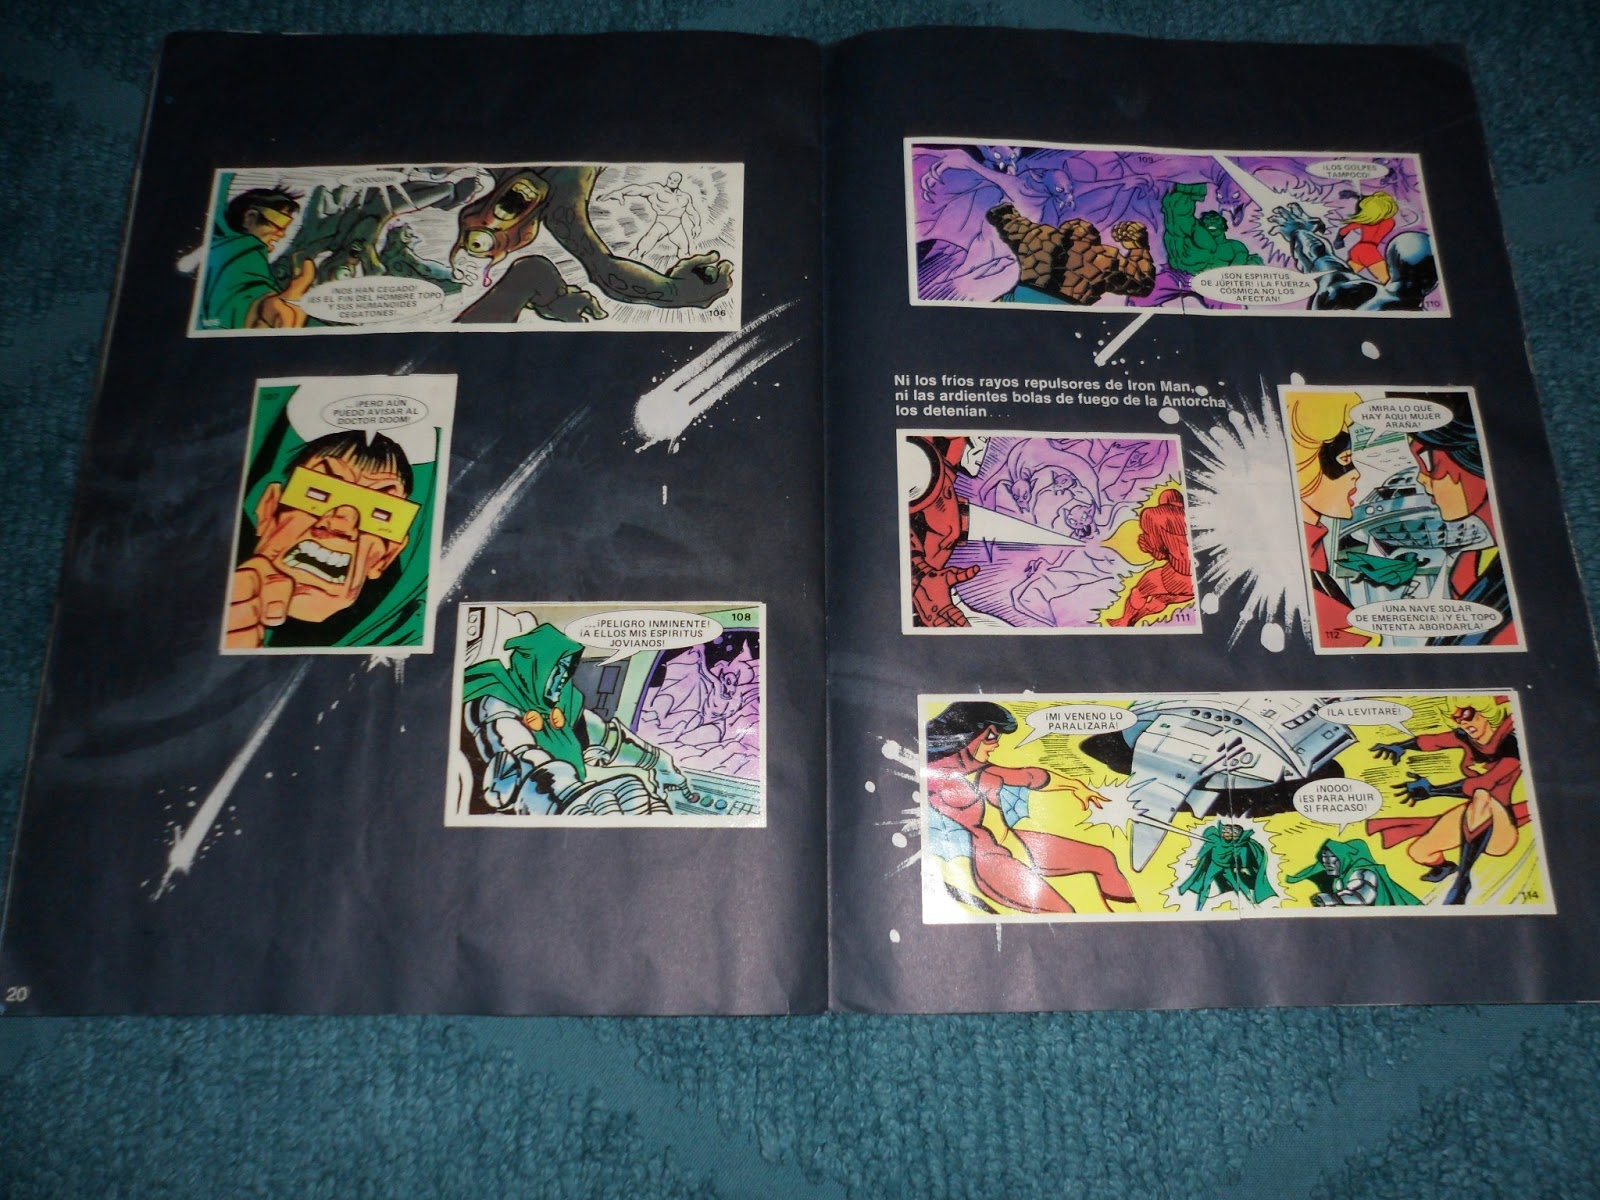 68-70 - [Comics] COLECCION CLARIN 2015: AVENGERS - Página 17 SAM_2357